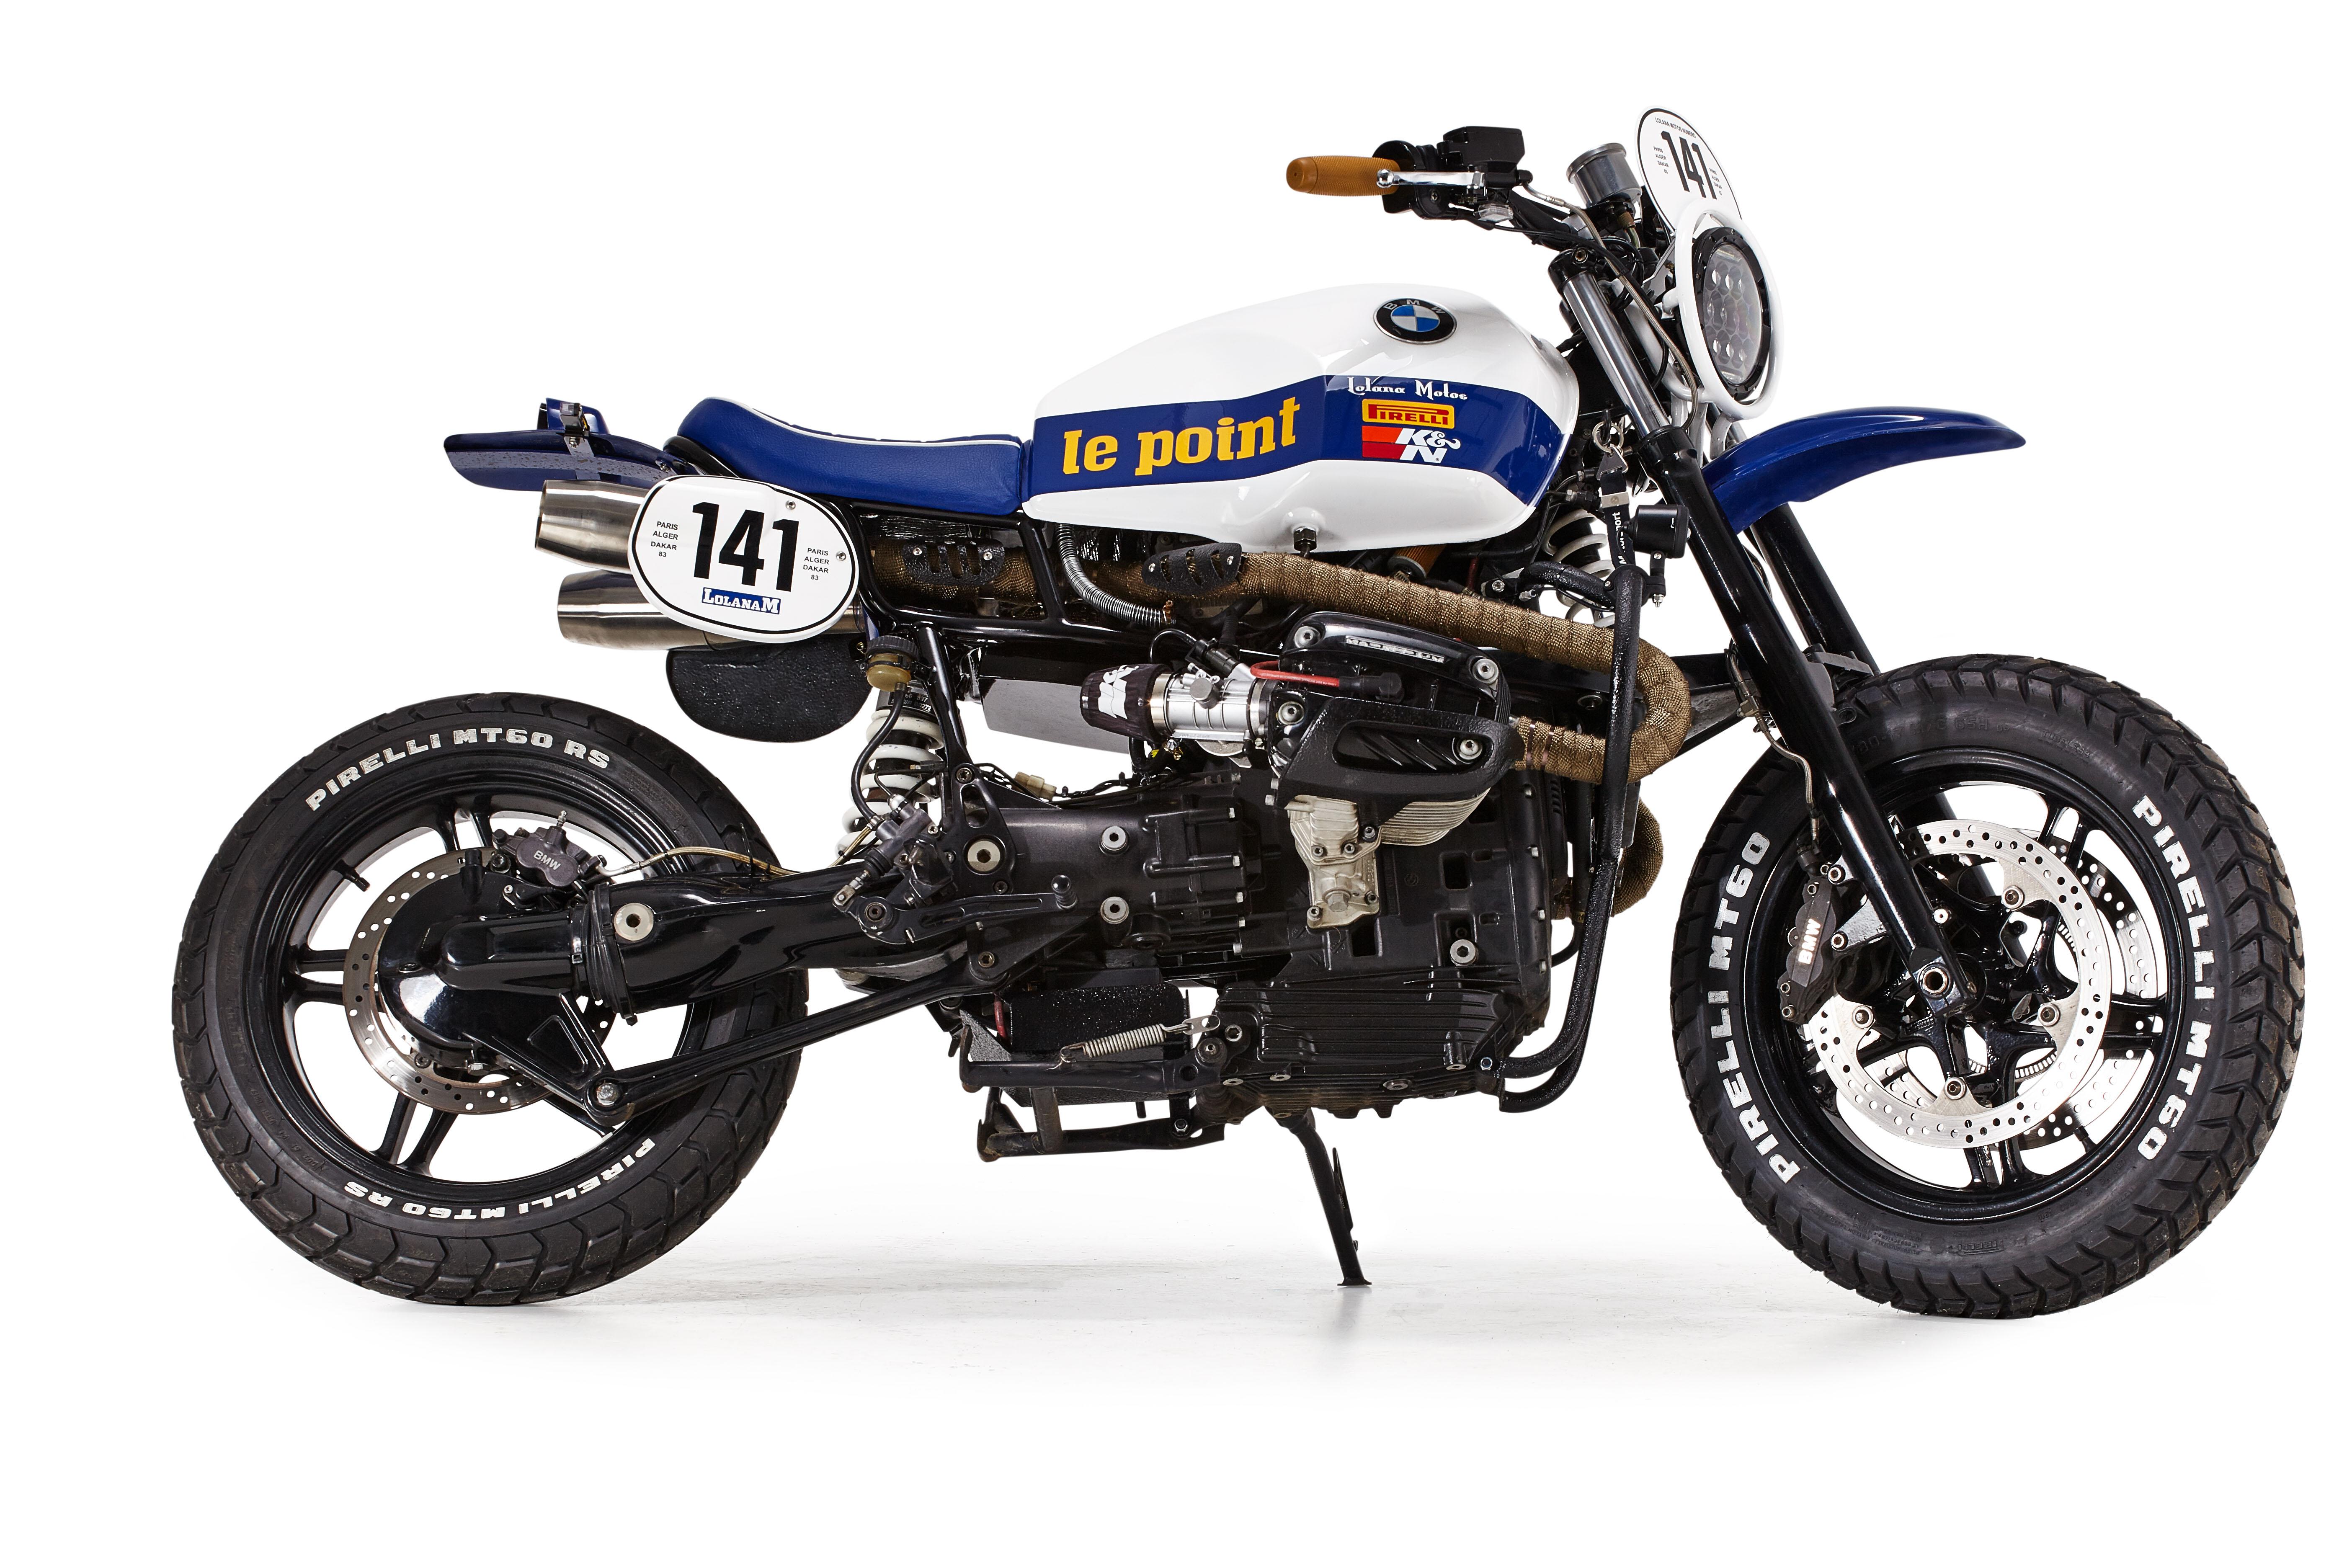 141 80's Dakar